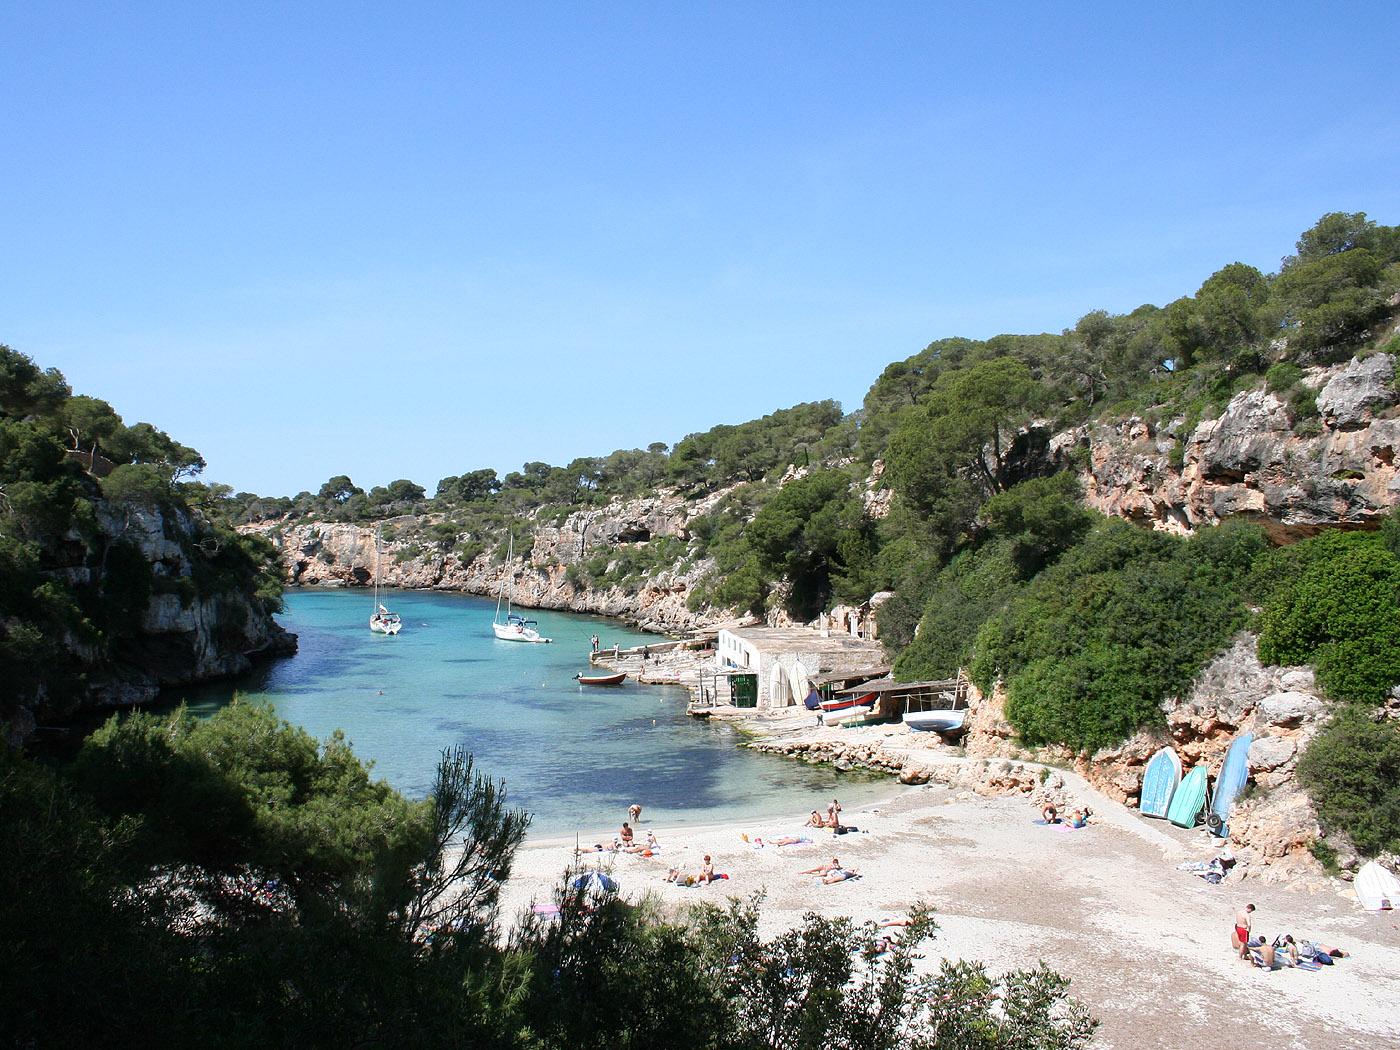 Palma de mallorca spain world travel destinations - Mallorca pictures ...